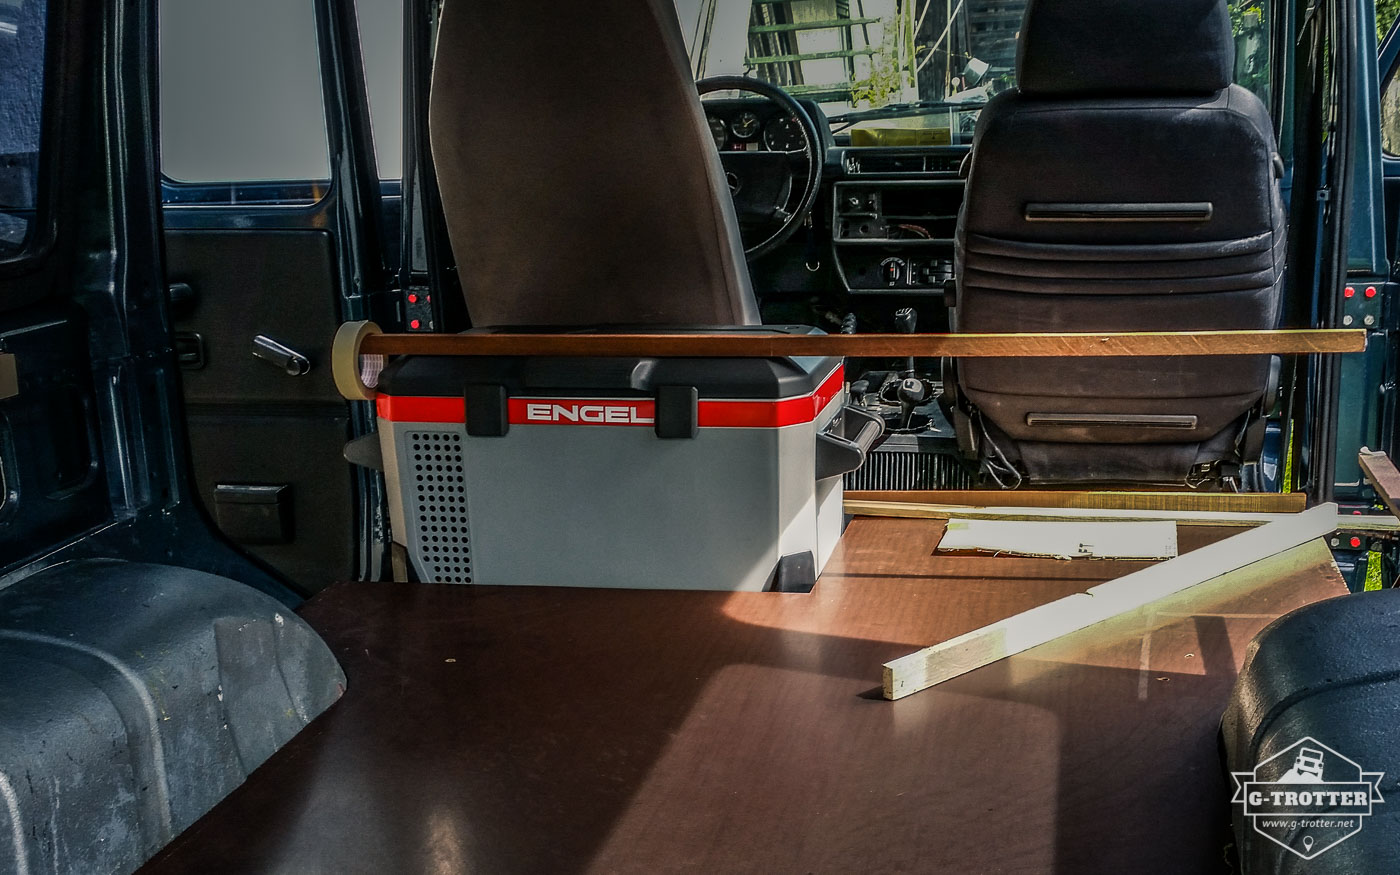 Engel Auto Kühlschrank : Equipment engel mr f kühlbox